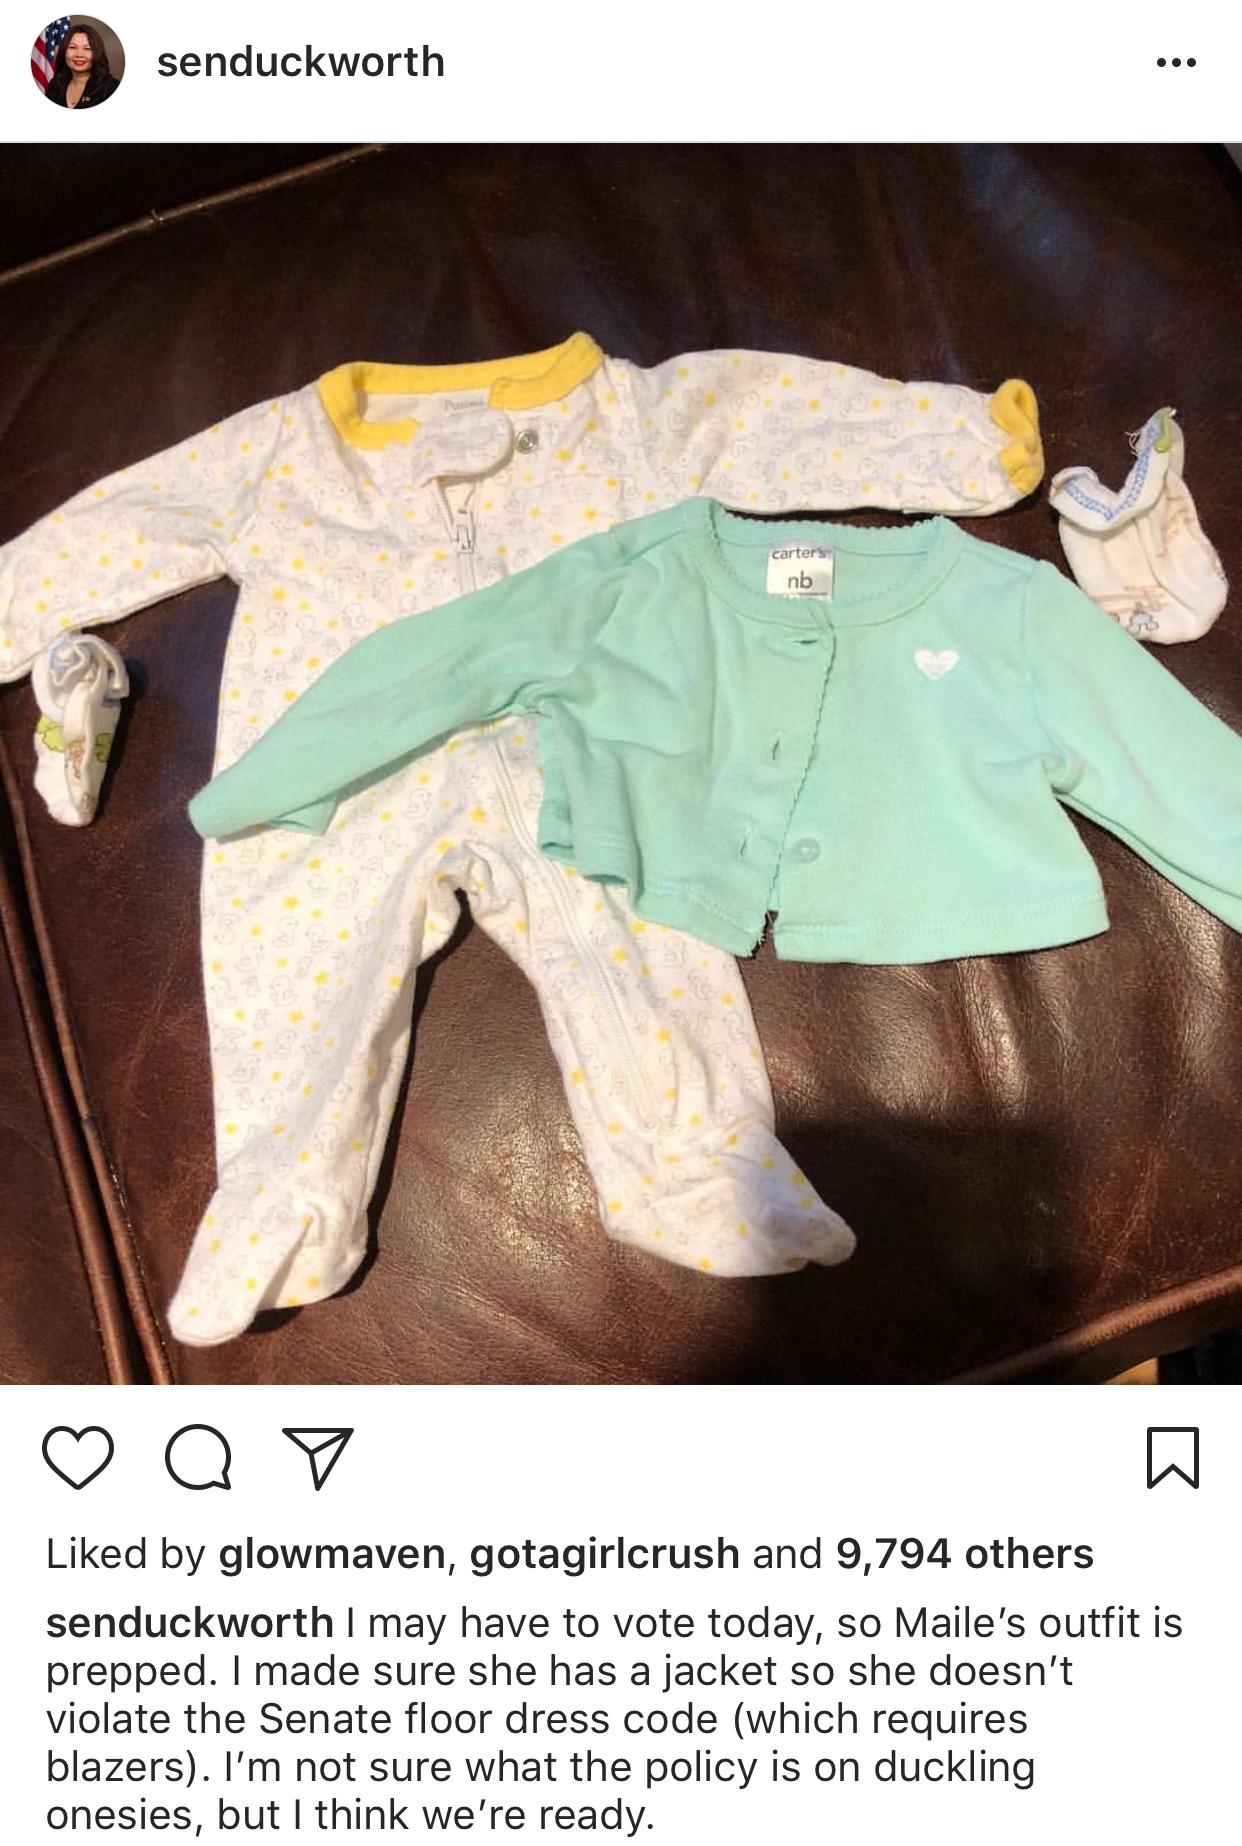 Duckworth's cute pre-vote Instagram post.